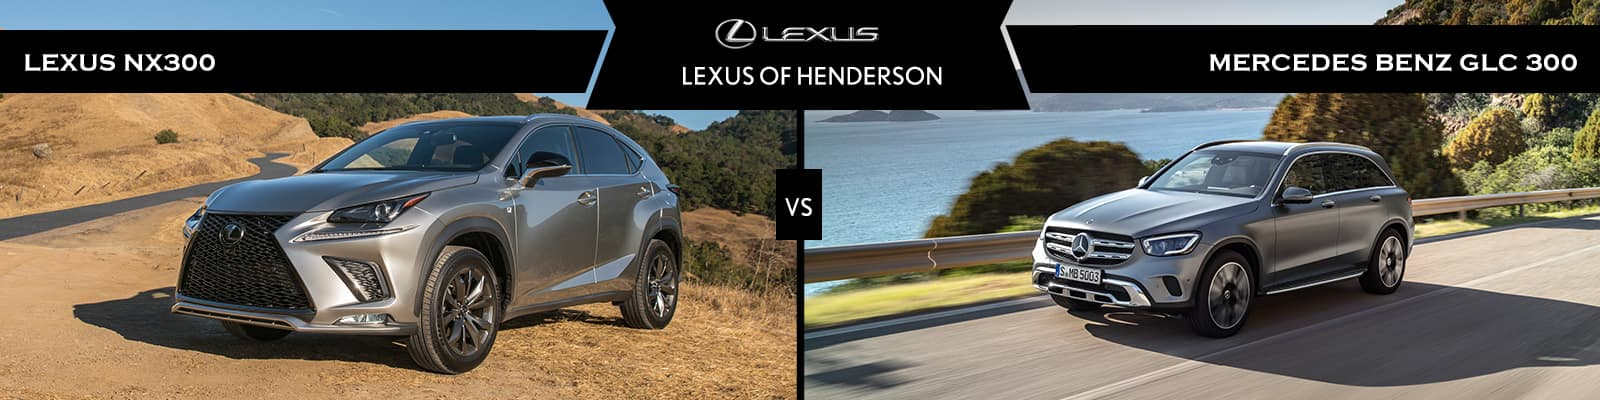 Lexus NX 300 vs Mercedes-Benz GLC